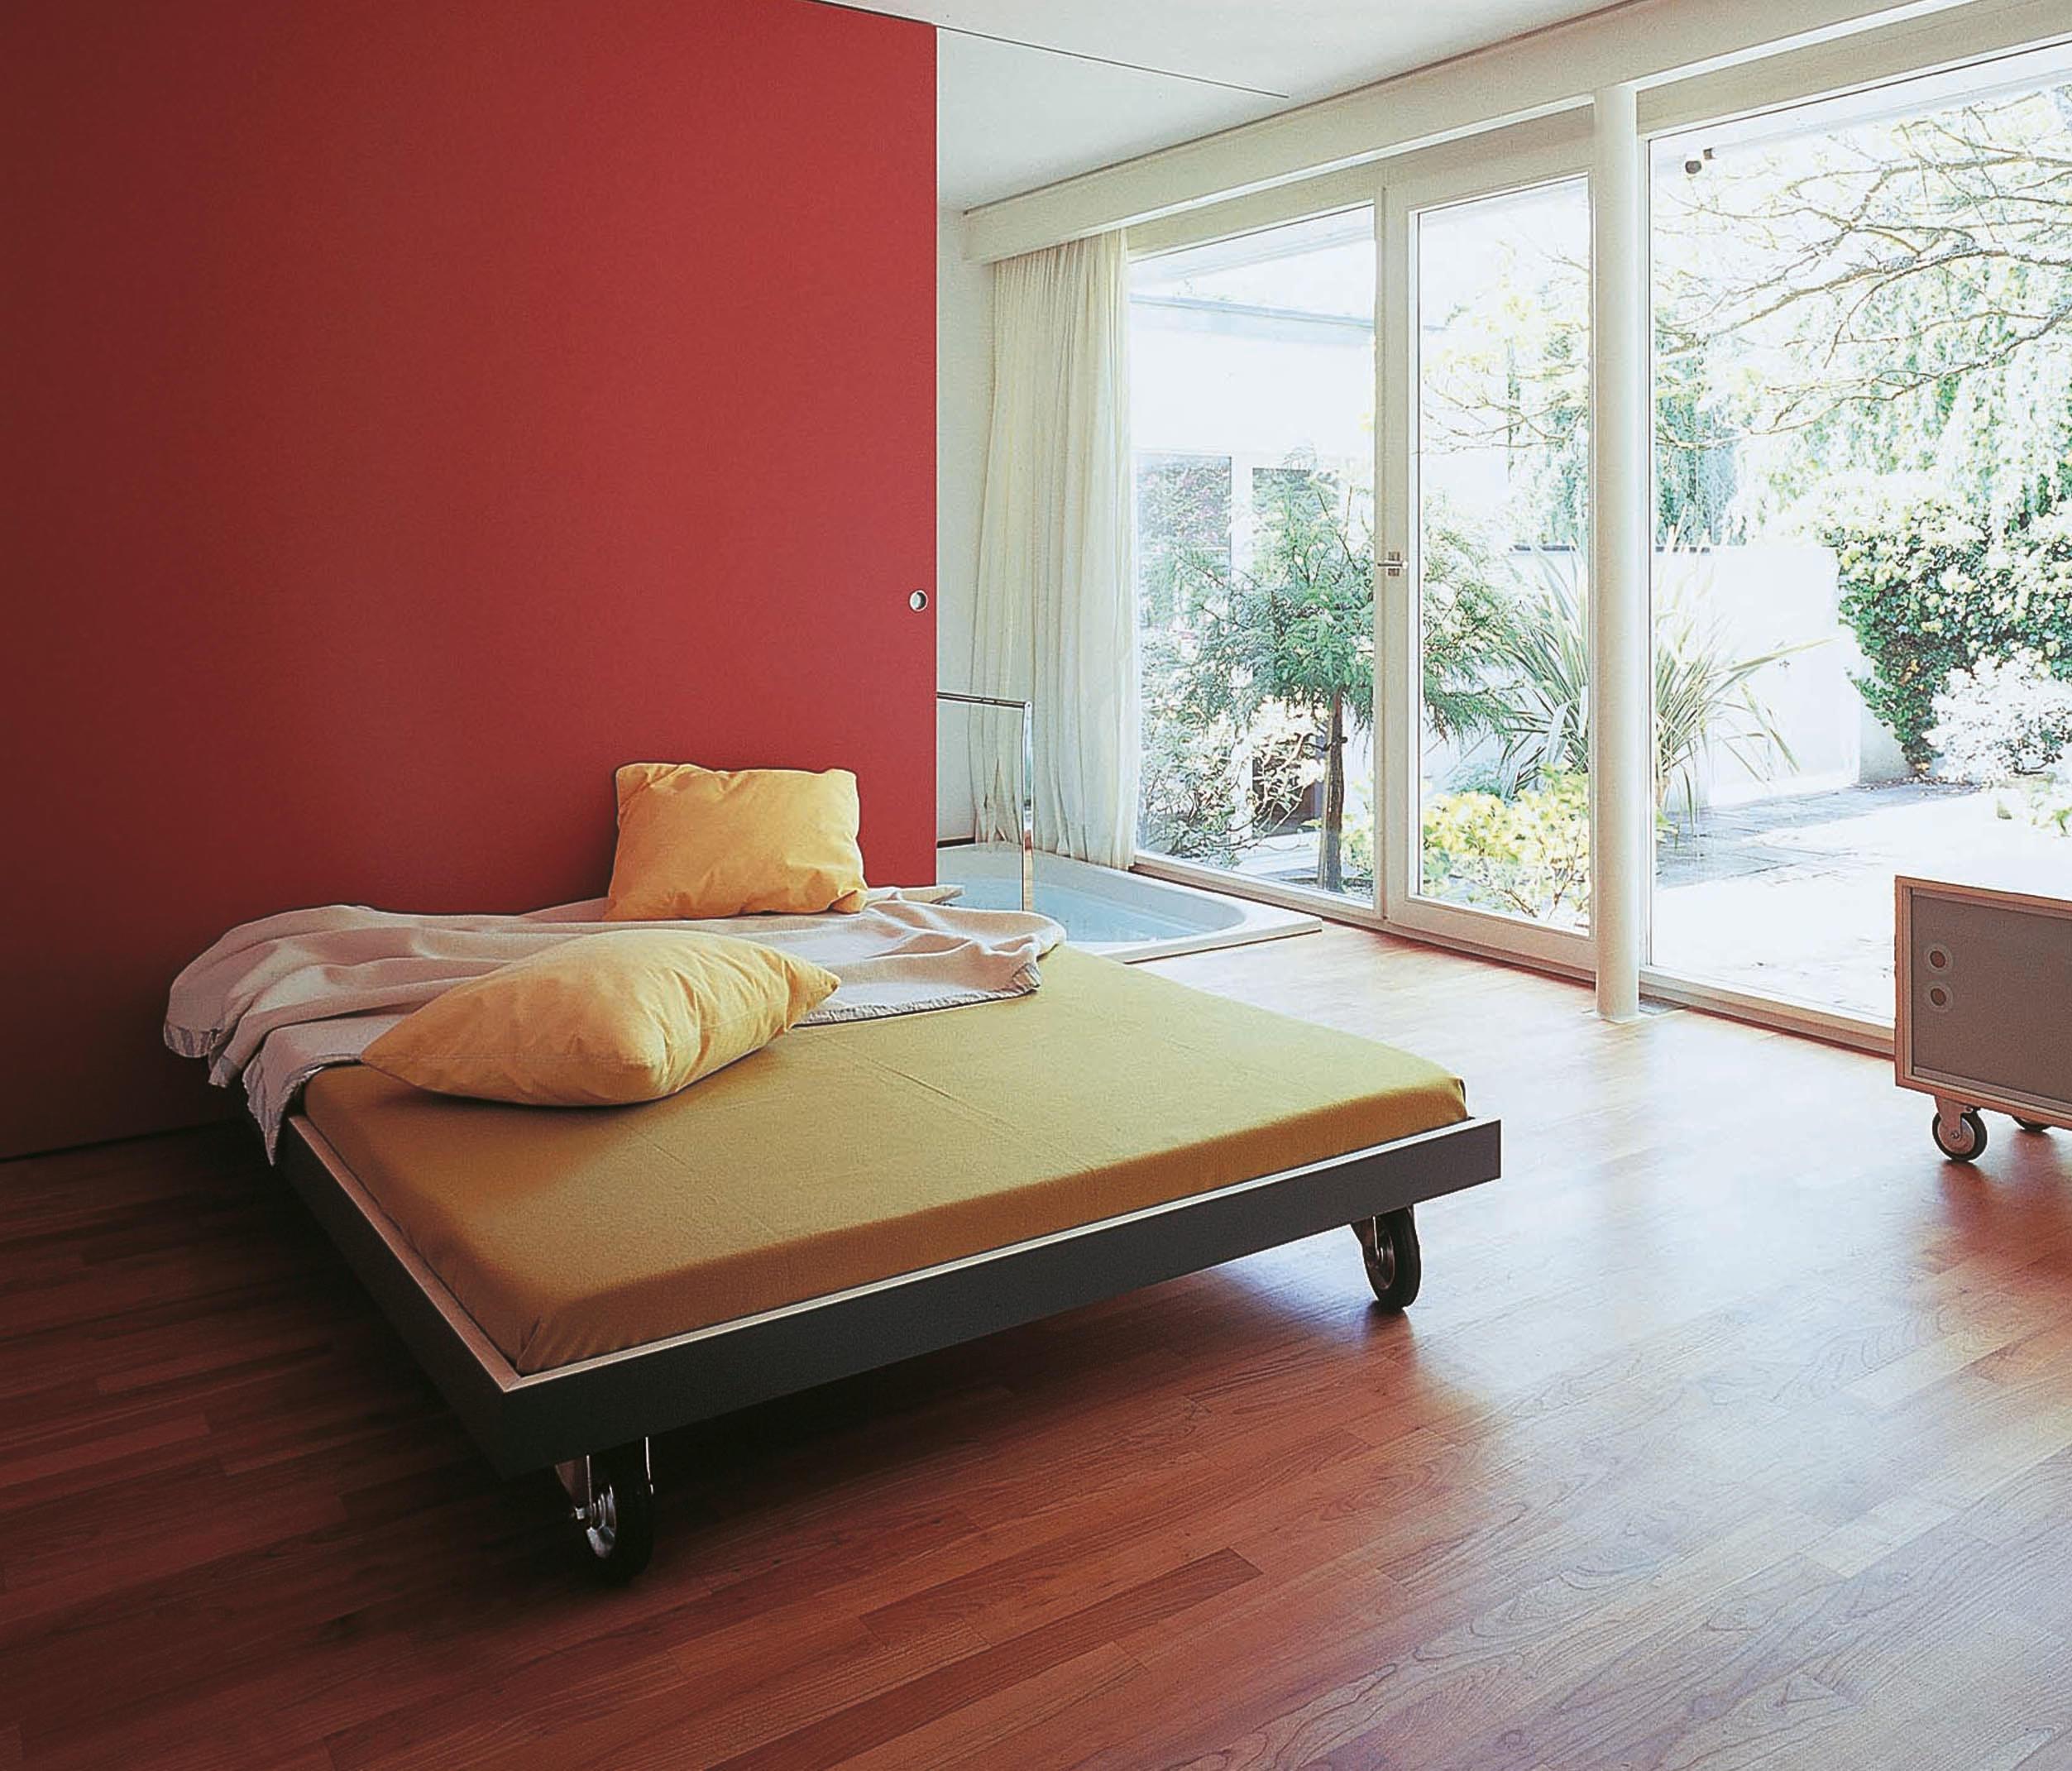 BETT BASIC - Betten von performa | Architonic